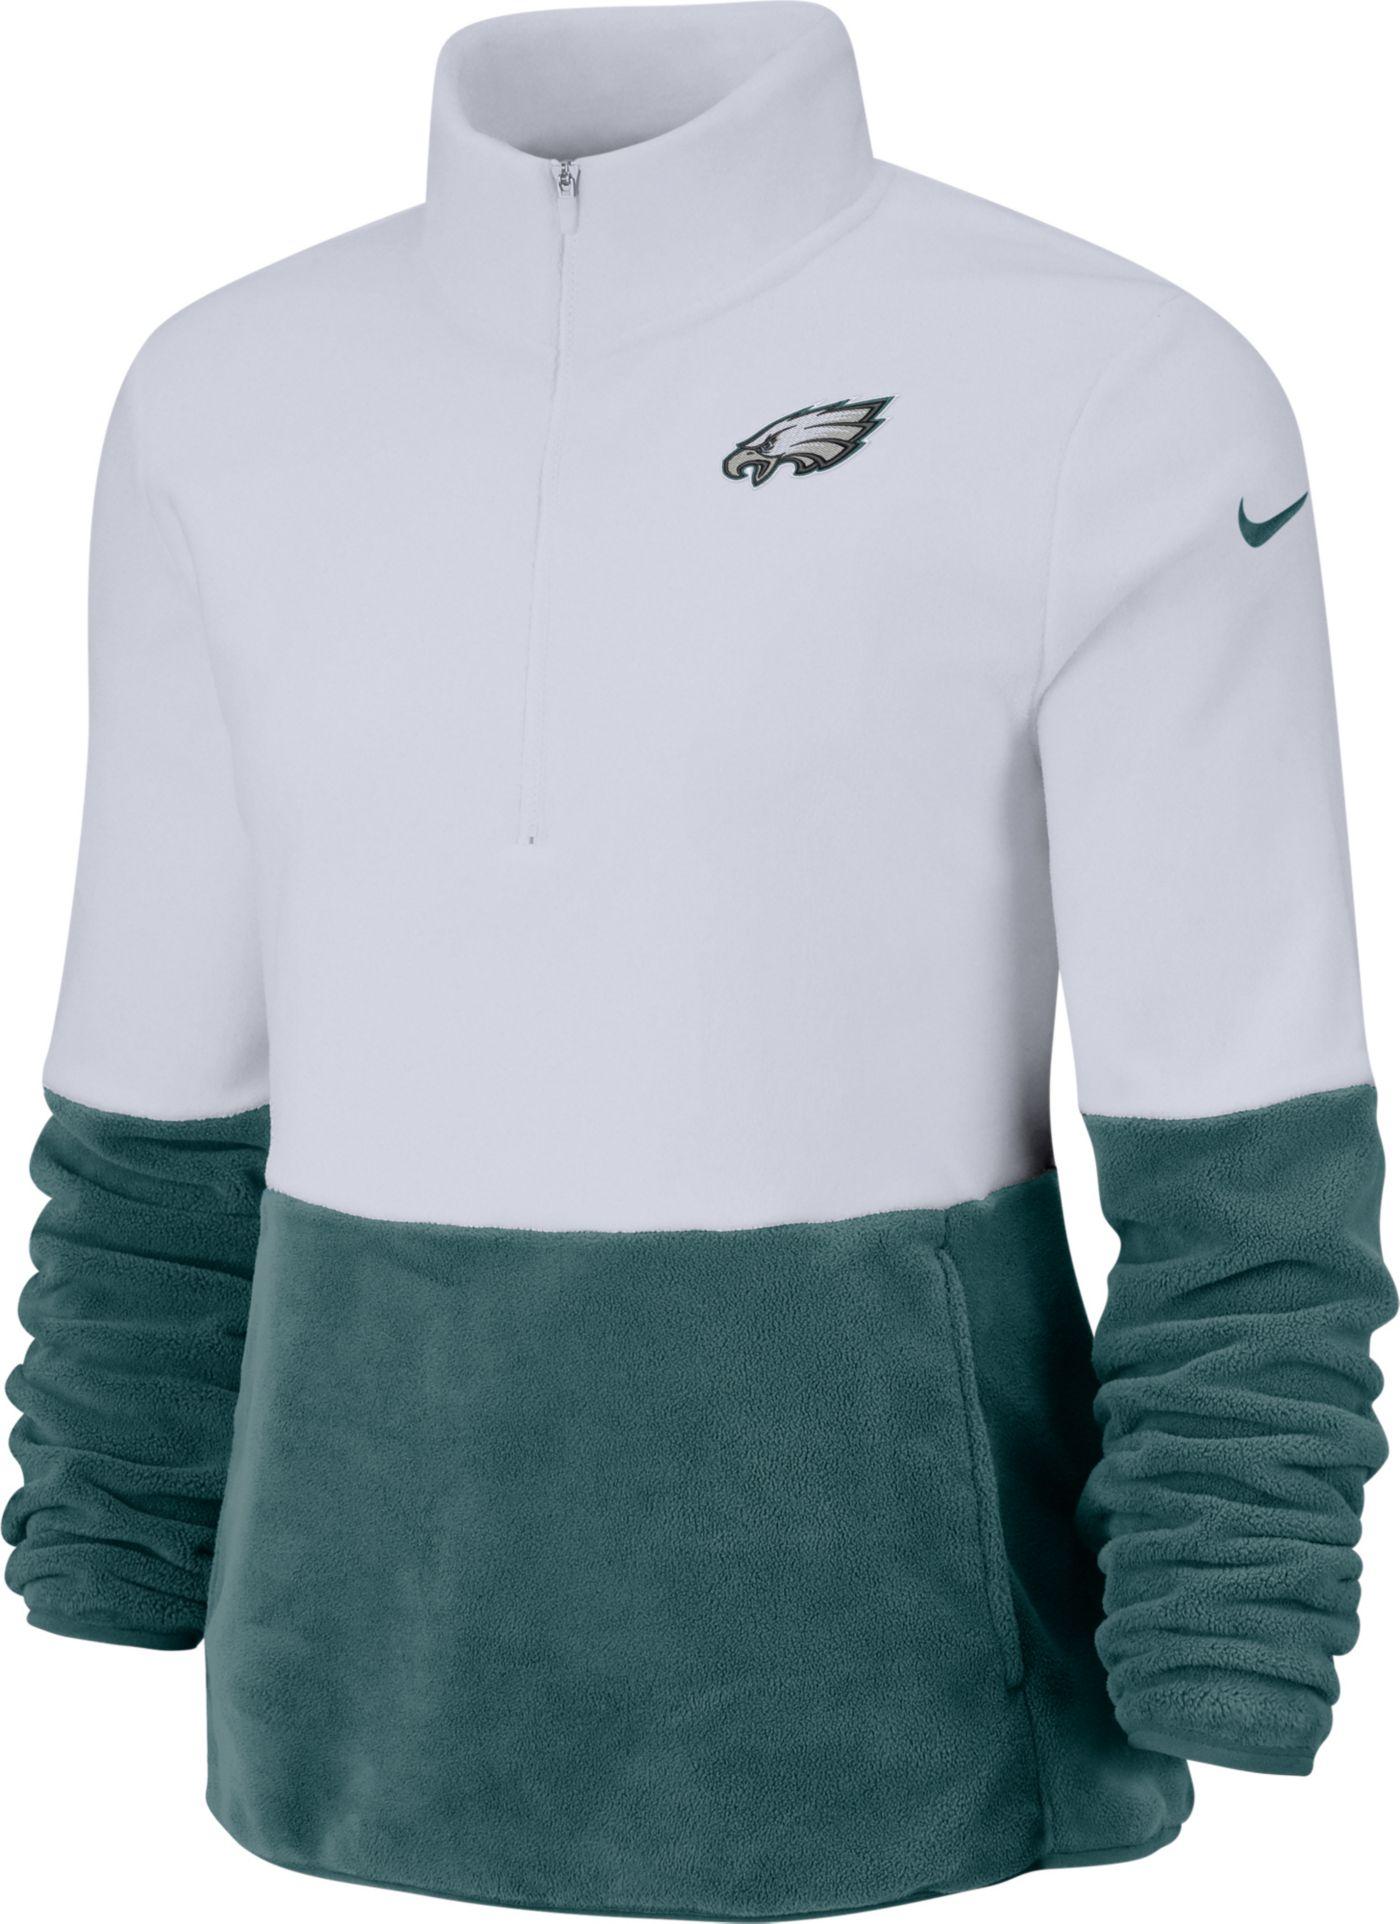 Nike Women's Philadelphia Eagles Therma-FIT Fleece Half-Zip Pullover